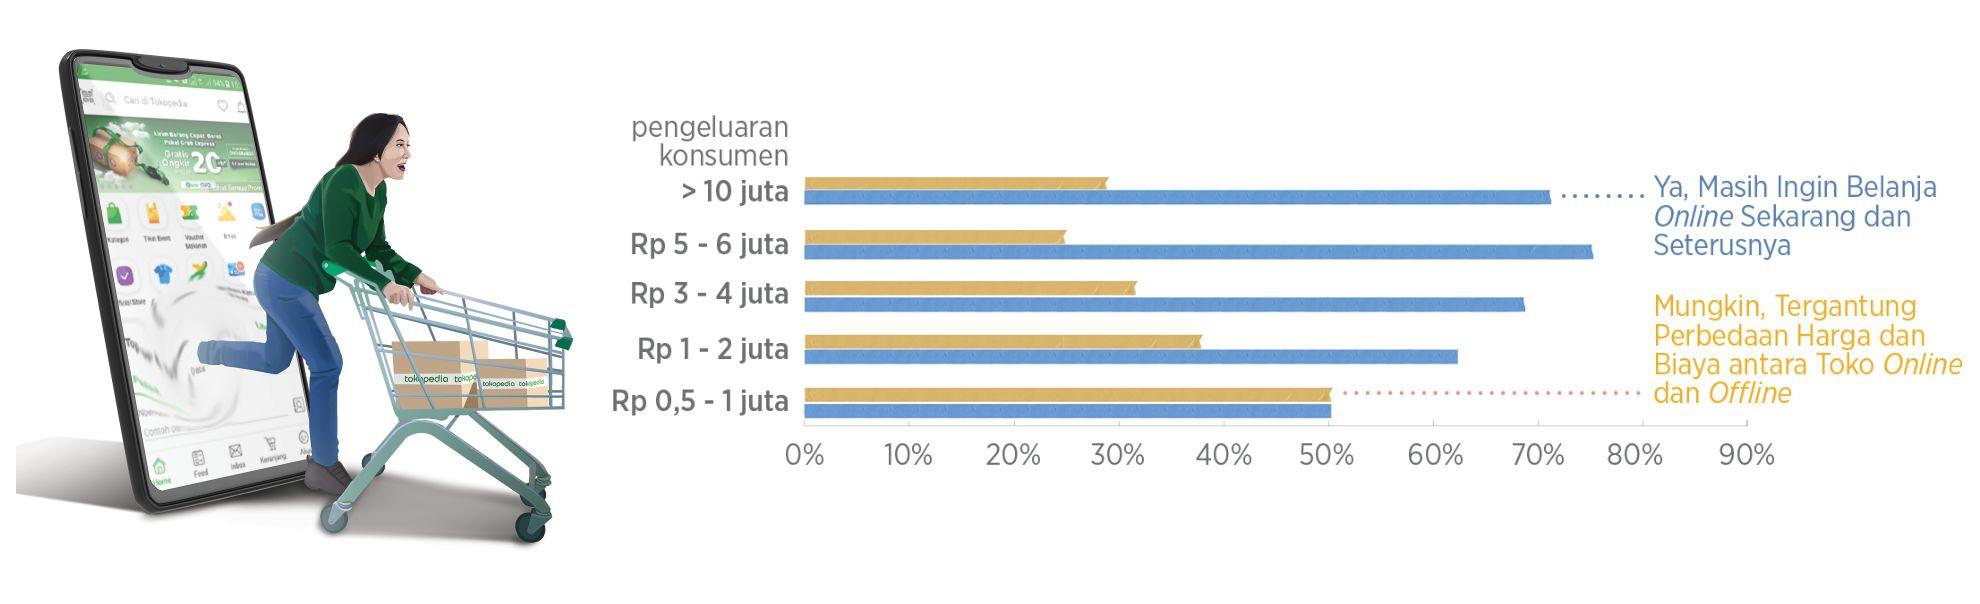 Grafik 9_2